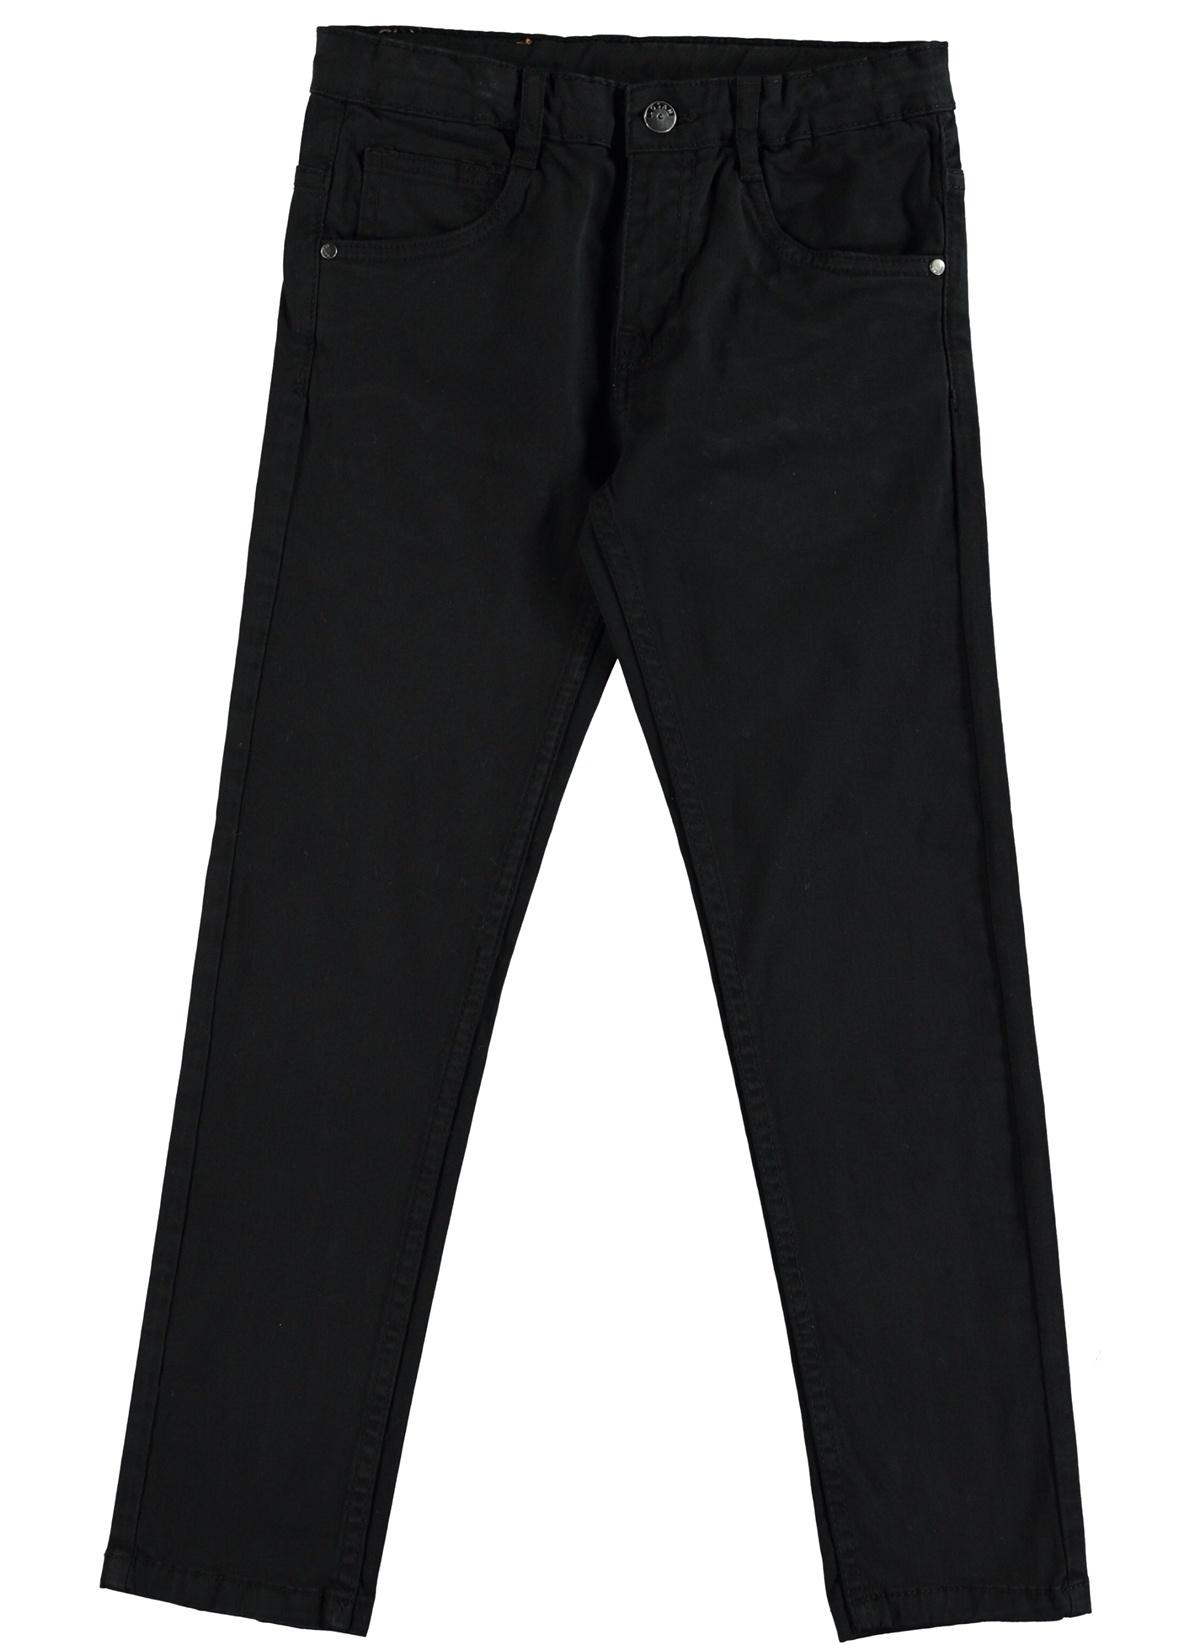 Losan Pantolon 723-9661aa Slım Fıt Pantolon – 50.99 TL